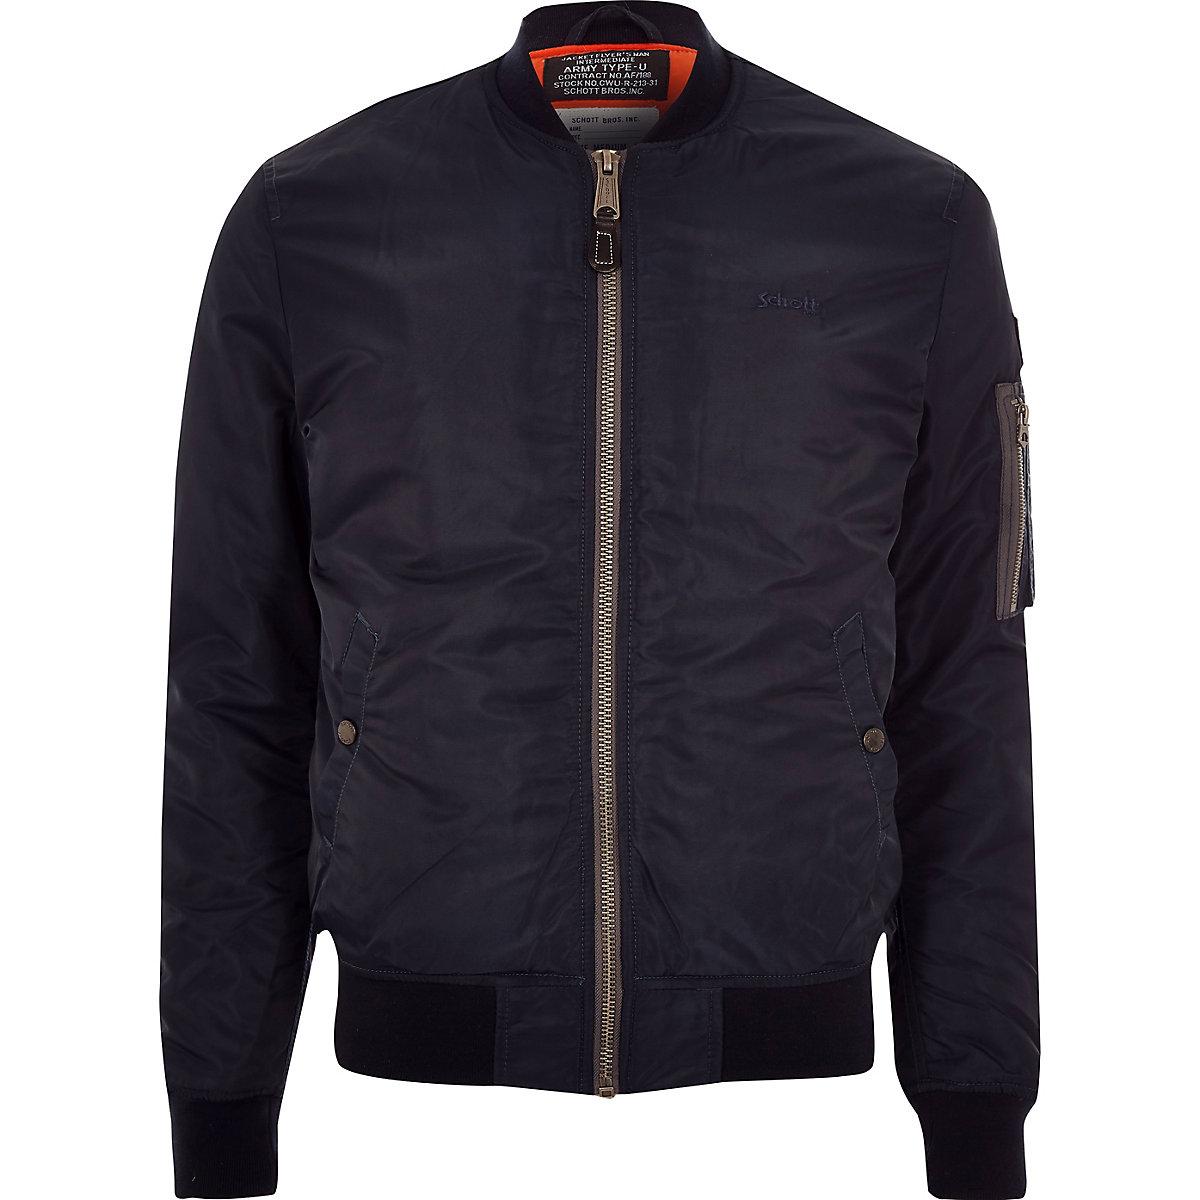 Schott dark blue bomber jacket